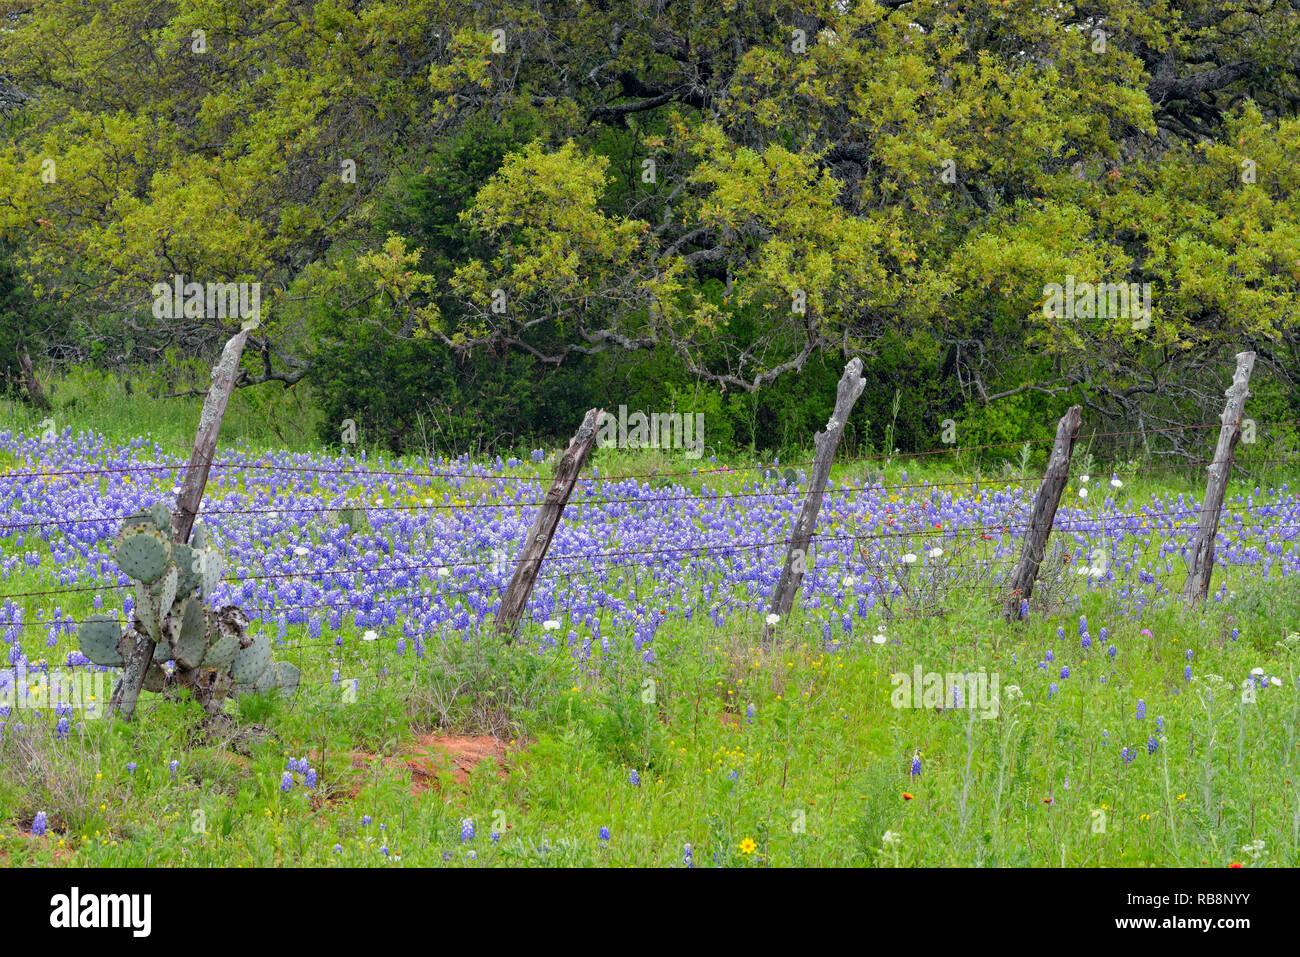 Texas bluebonnets near a country fence, Gillespie County, Texas, USA - Stock Image